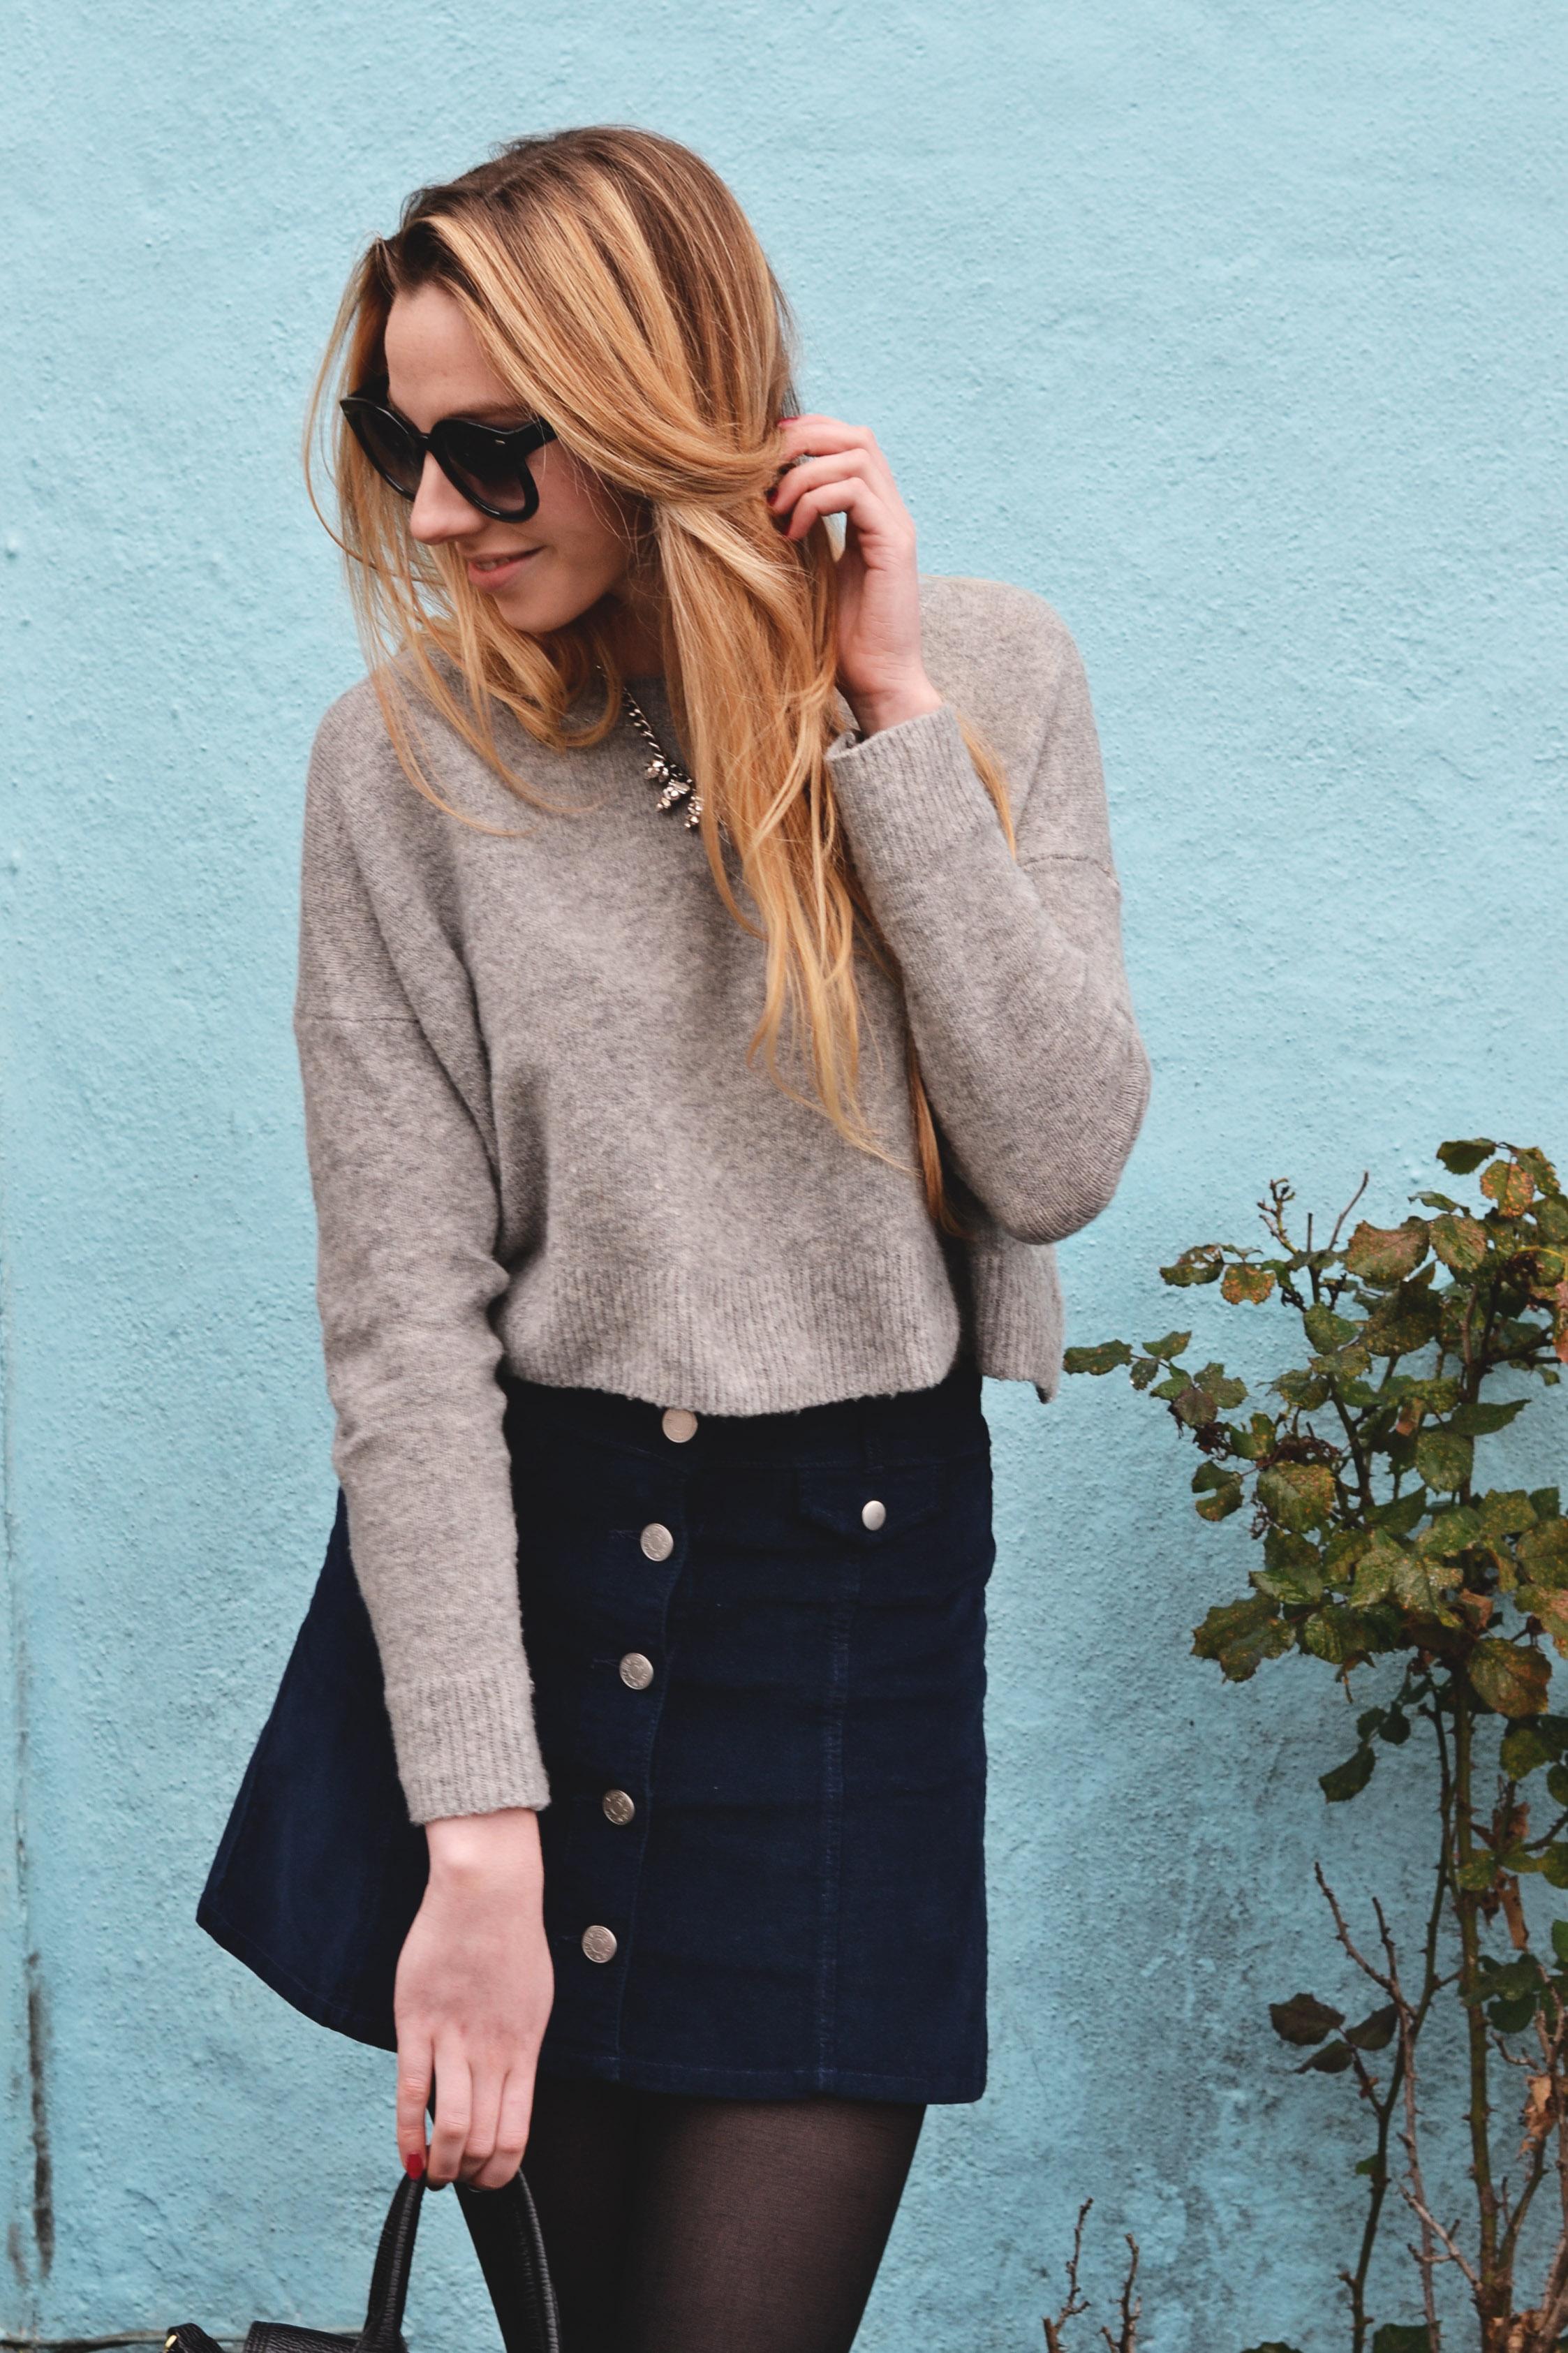 Corduroy Skirt & Cropped Sweater (via Girl x Garment)